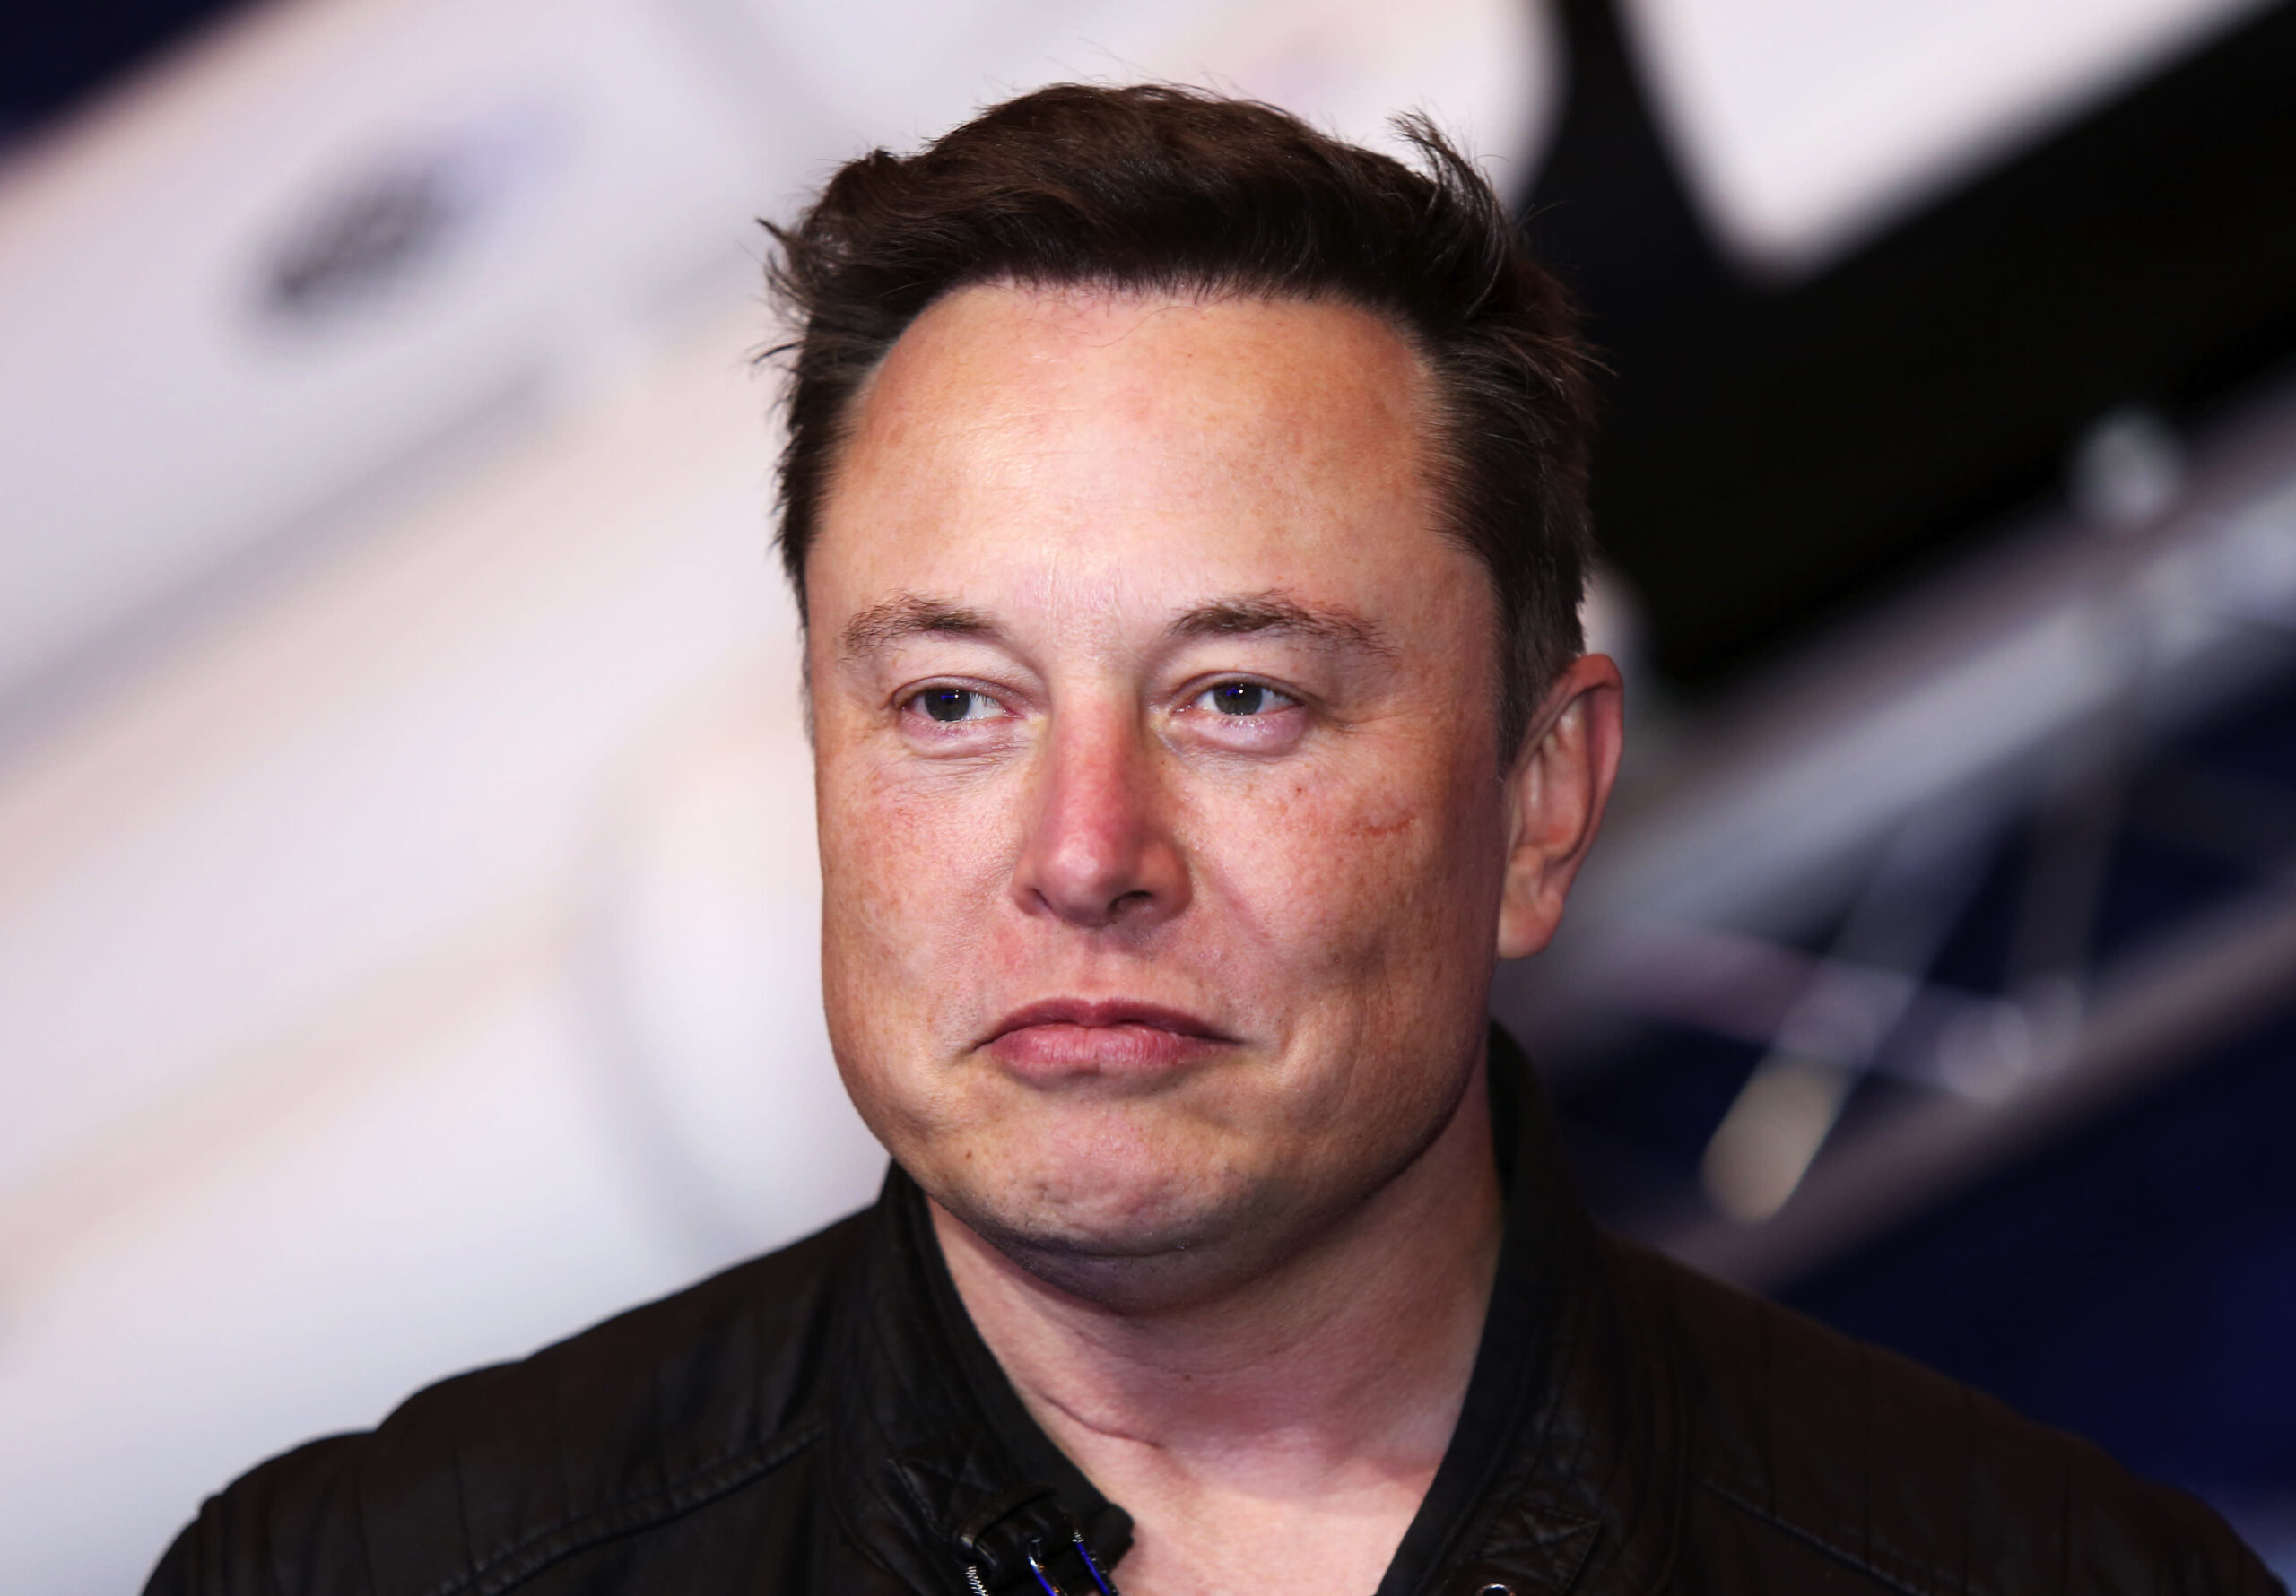 Elon Musk should apologize for mocking gender pronouns, says HRC